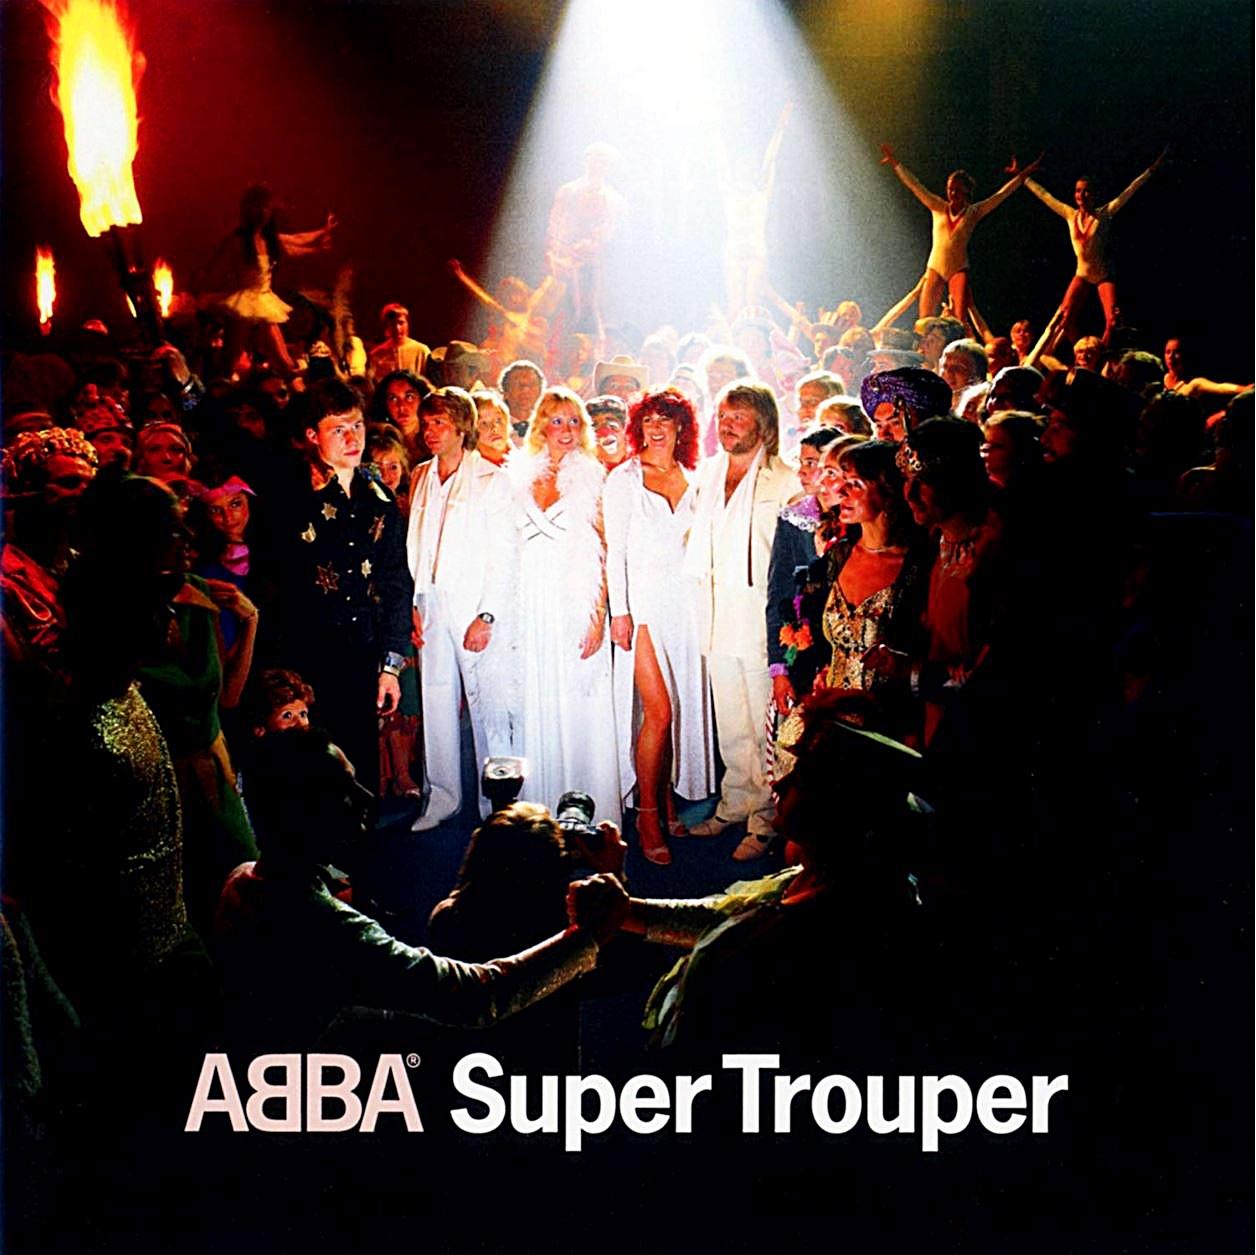 ABBA의 Super Trouper 음반 표지